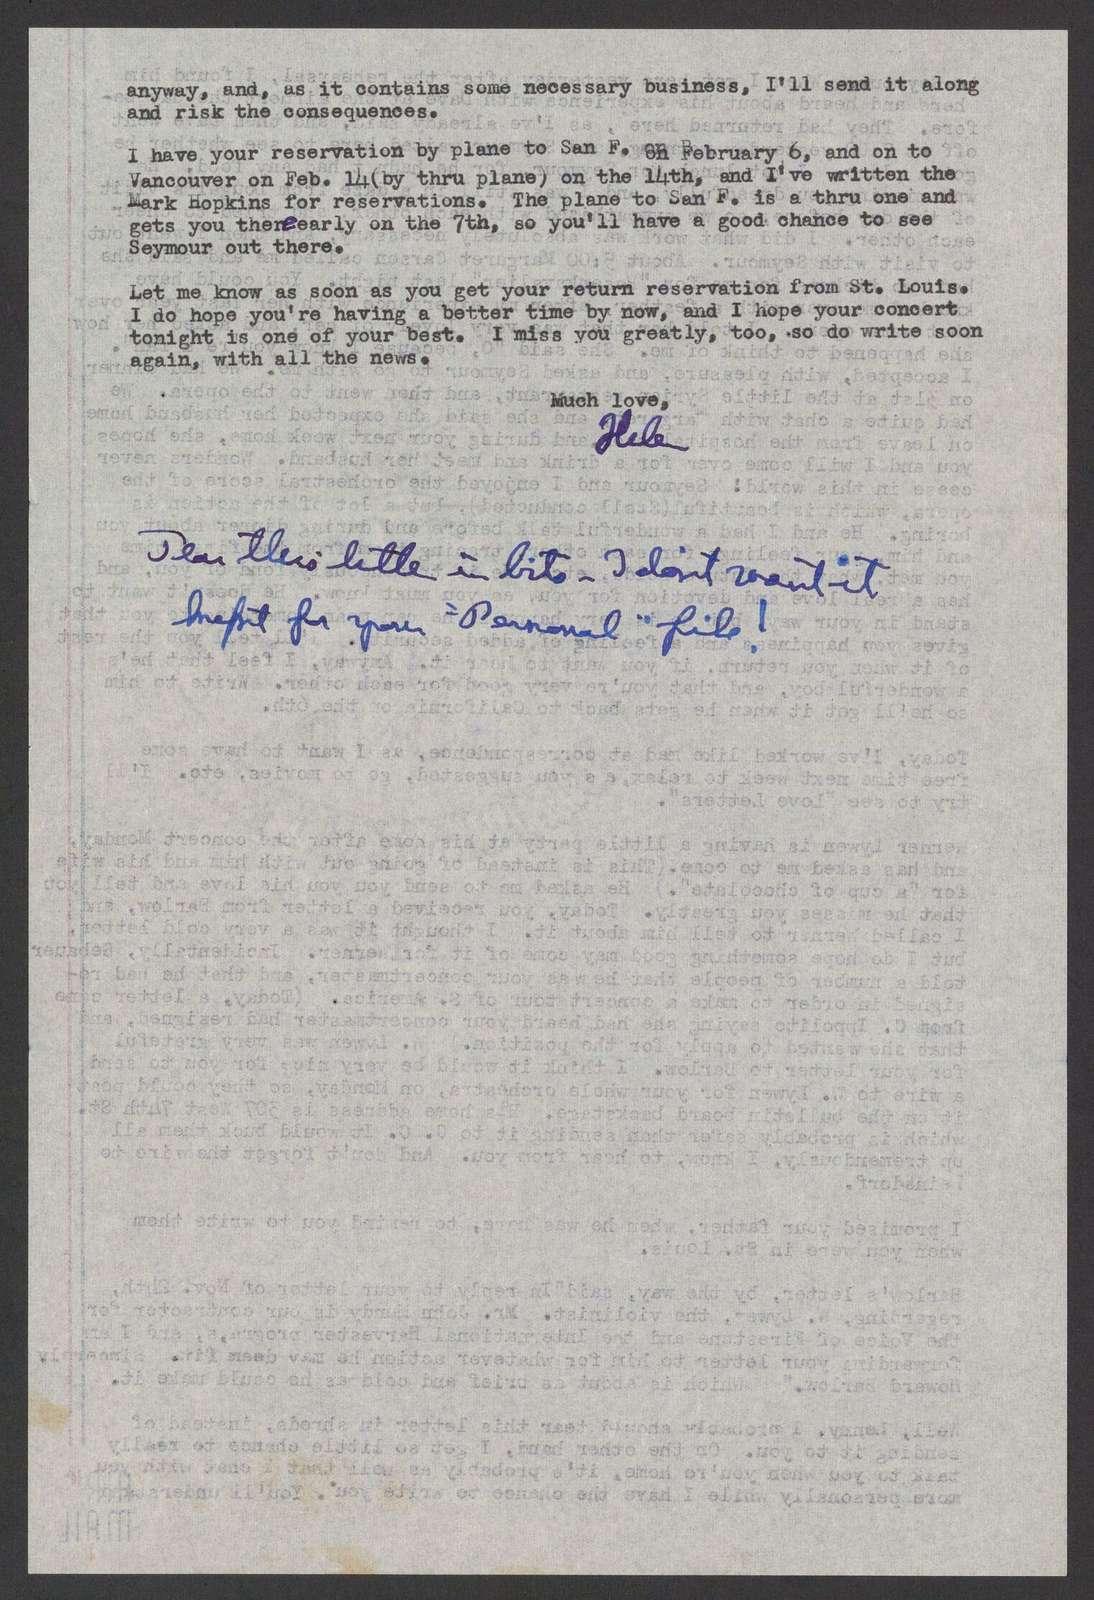 Helen Coates to Leonard Bernstein, December 1, 1945